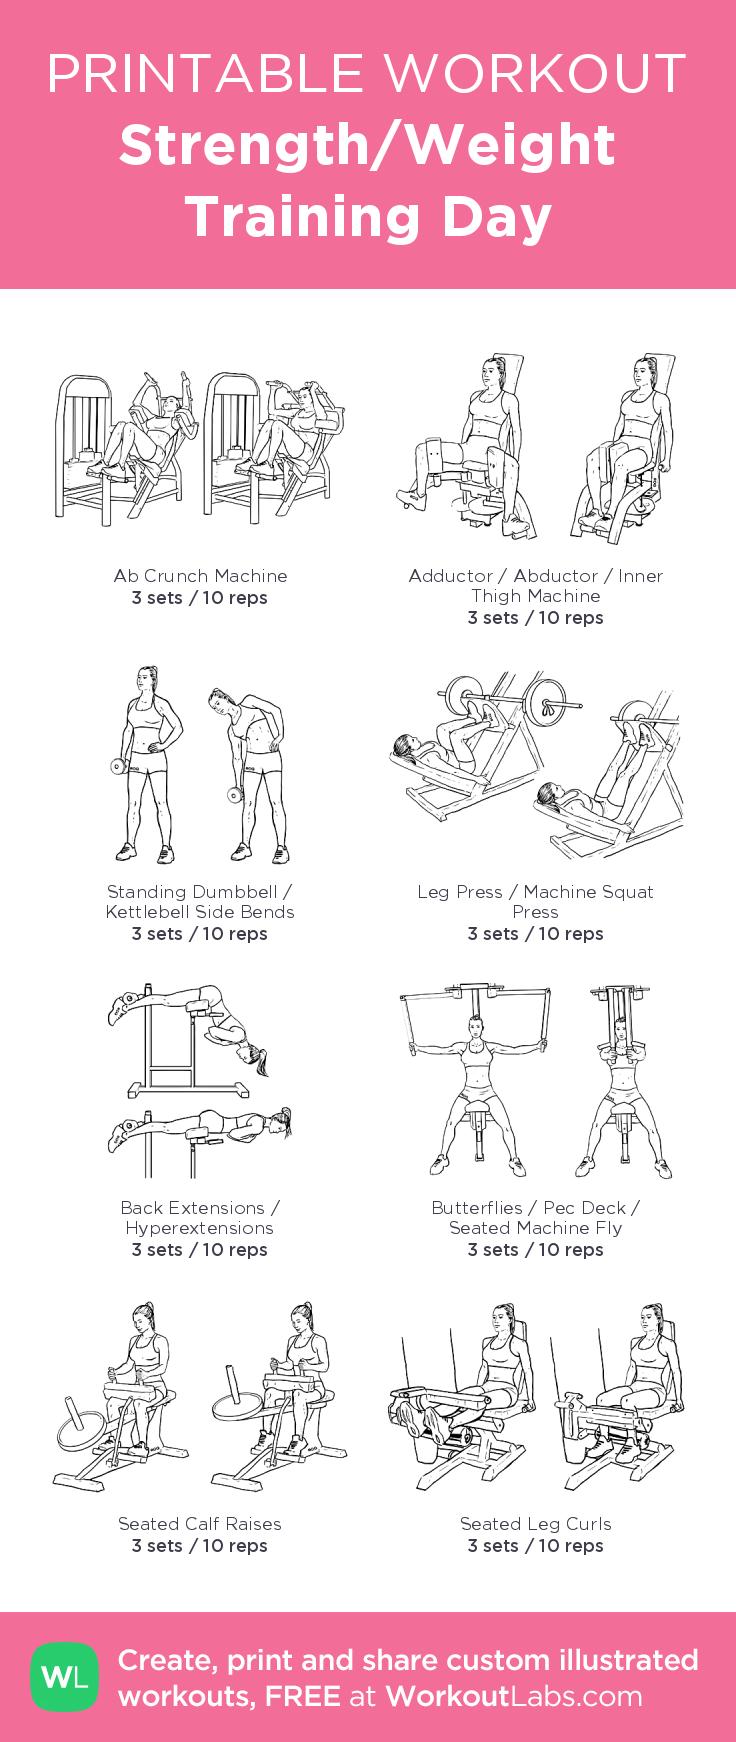 Strength/Weight Training Day